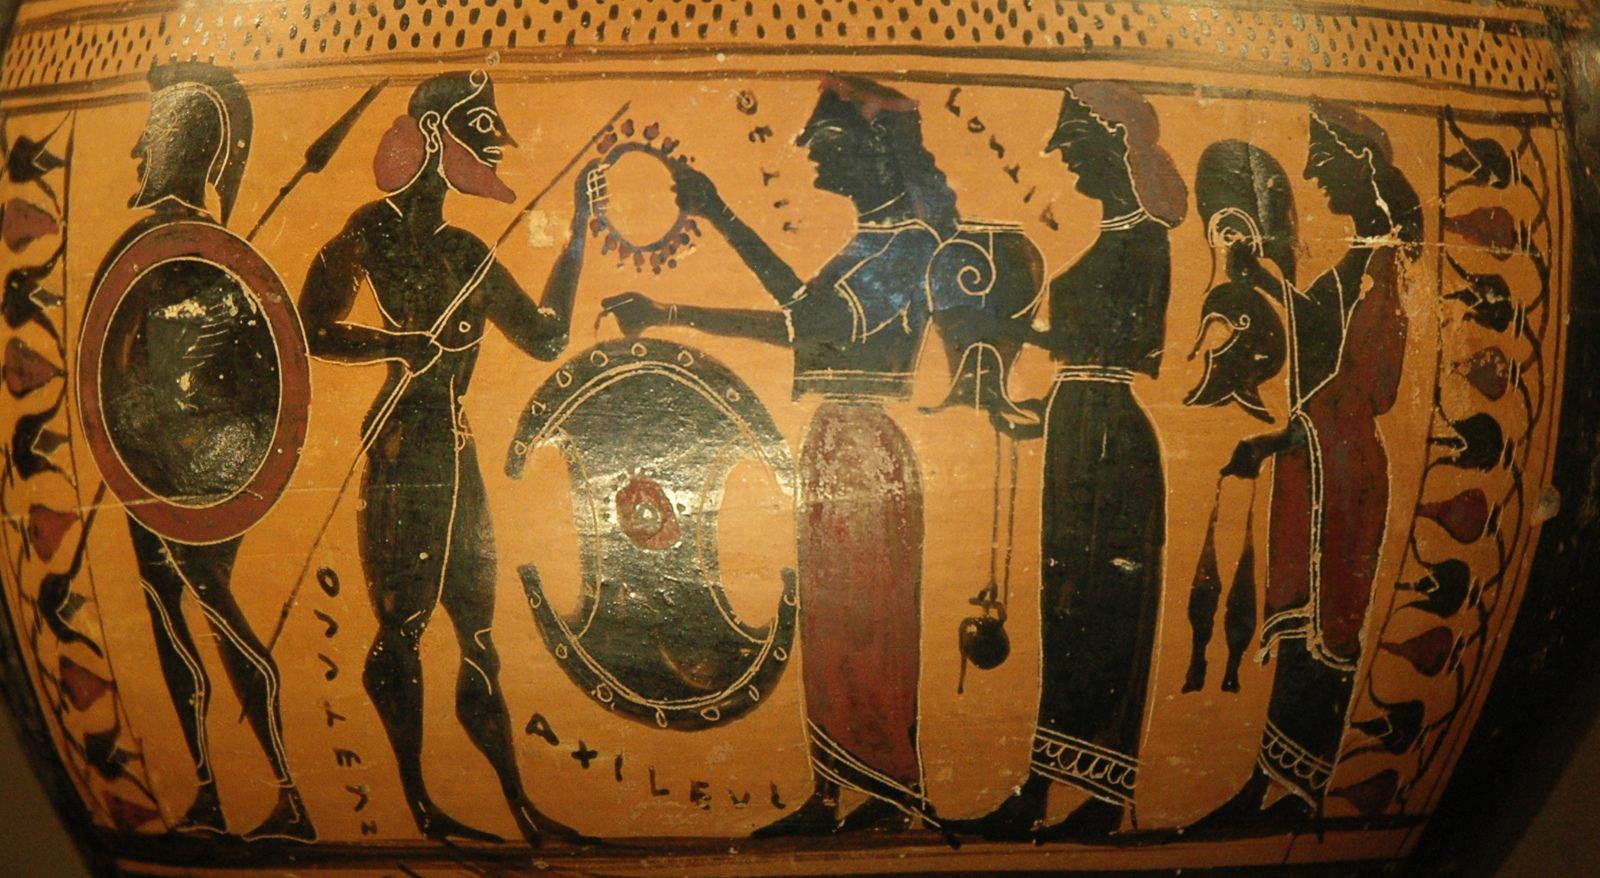 "Attisch-schwarzfigurige Hydria, gegen 570/60 v. Chr. Ton. Paris, Musée du Louvre Inv. E 869.<br>Quelle: <a href=""https://commons.wikimedia.org/wiki/File:Hydria_Achilles_weapons_Louvre_E869.jpg"">User:Jastrow / Wikimedia Commons</a><br> Lizenz: Public Domain"